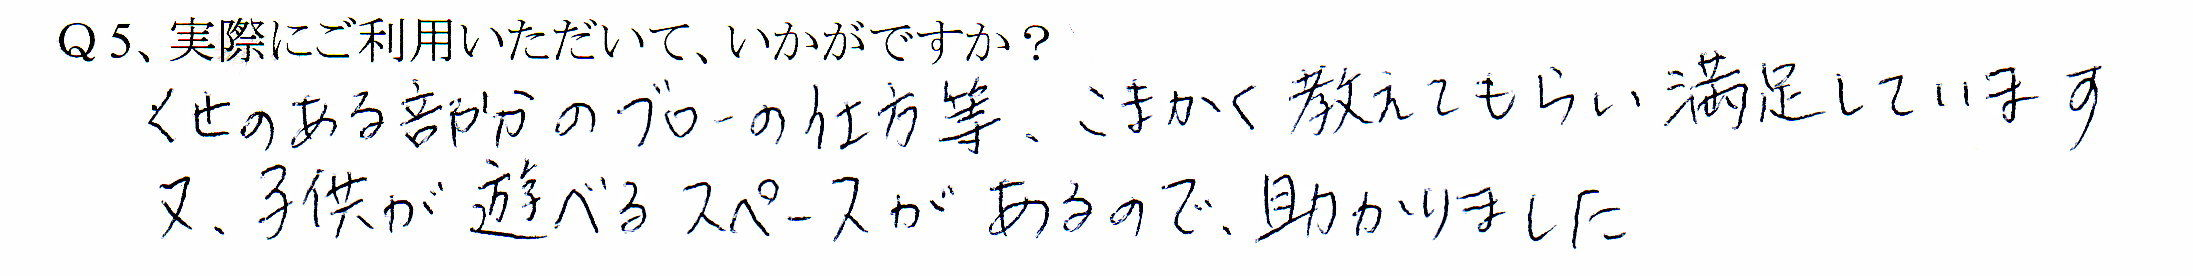 15KI様Q5